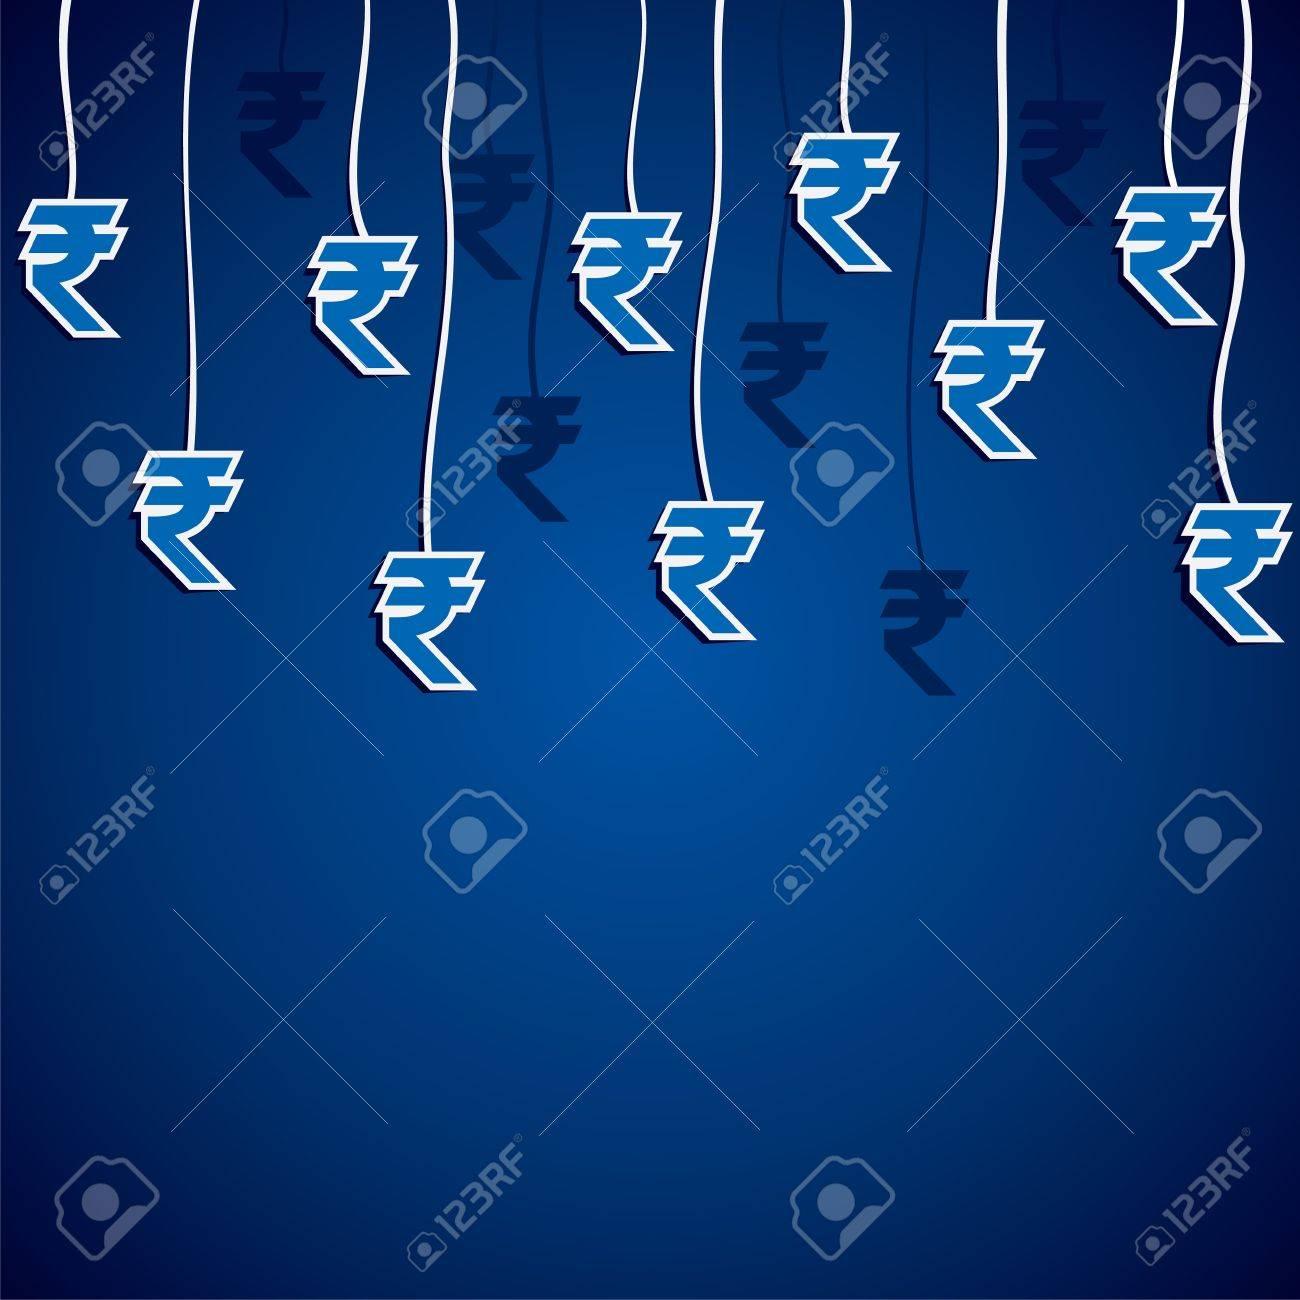 Rupee Note Vector Vector Rupee Currency Symbol